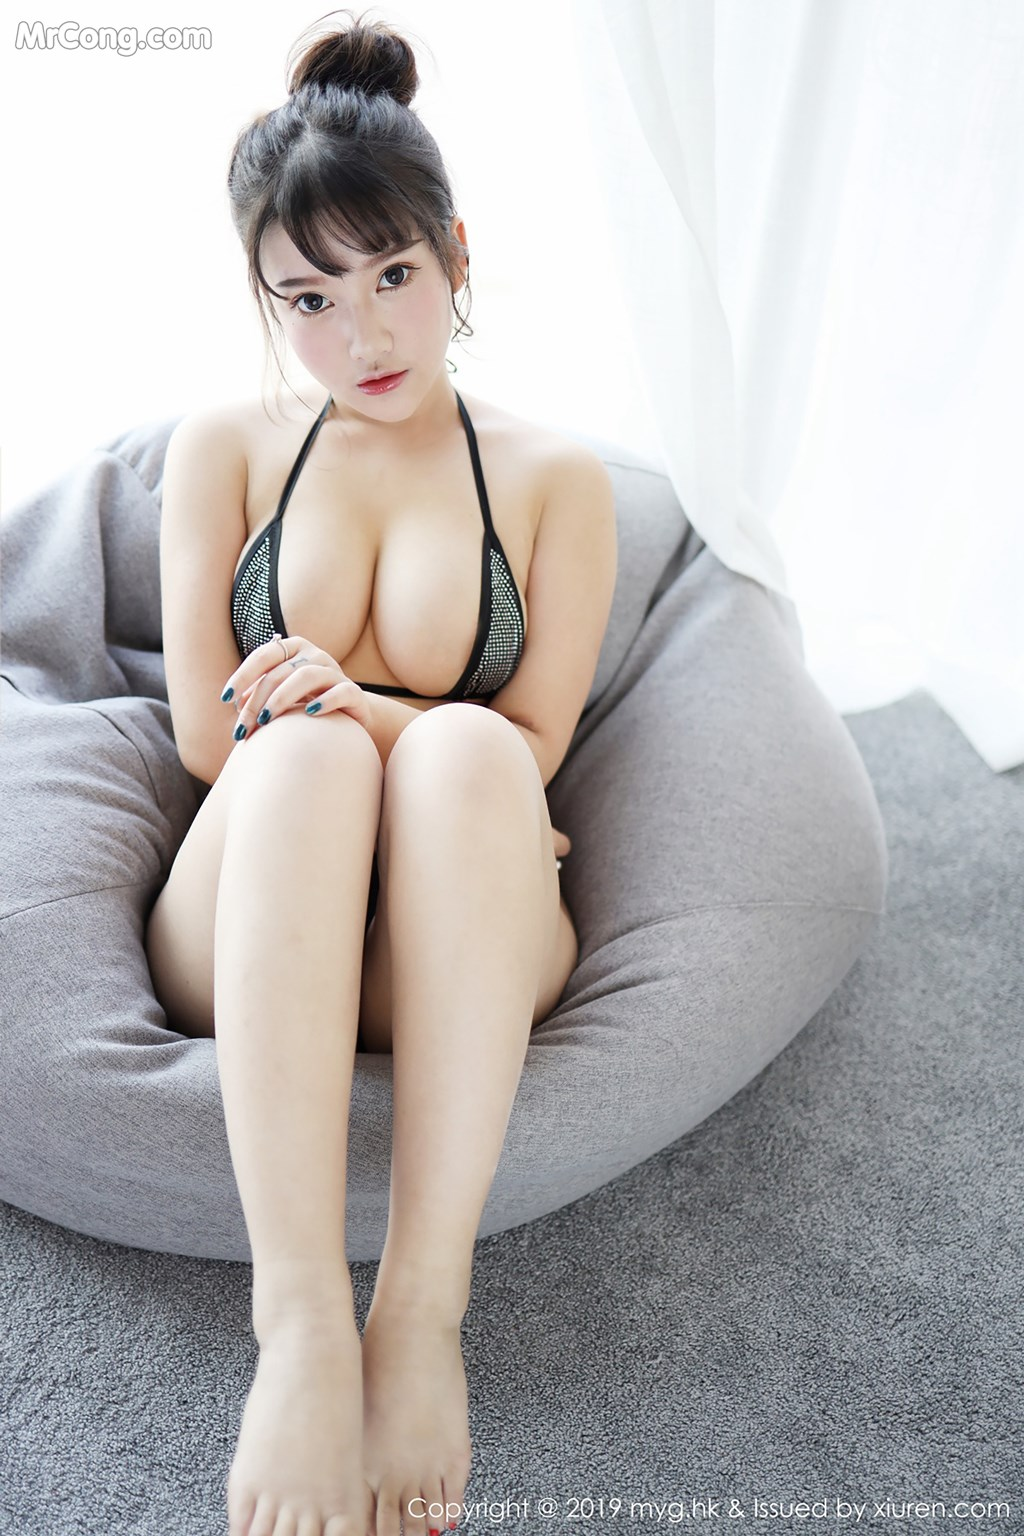 Image MyGirl-Vol.342-Xiao-You-Nai-MrCong.com-027 in post MyGirl Vol.342: Người mẫu Xiao You Nai (小尤奈) (41 ảnh)